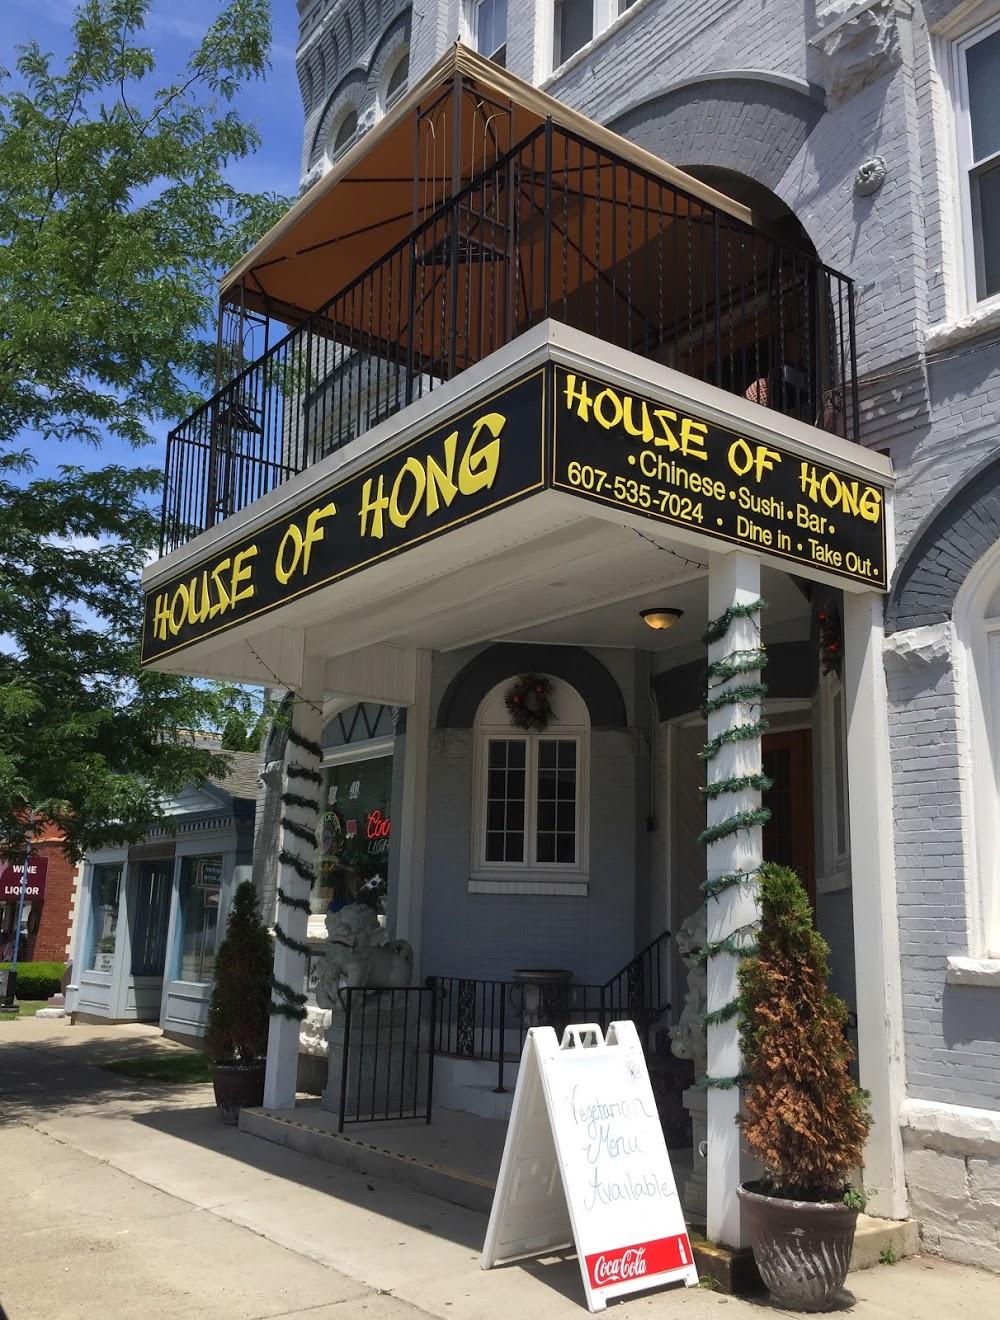 House of Hong